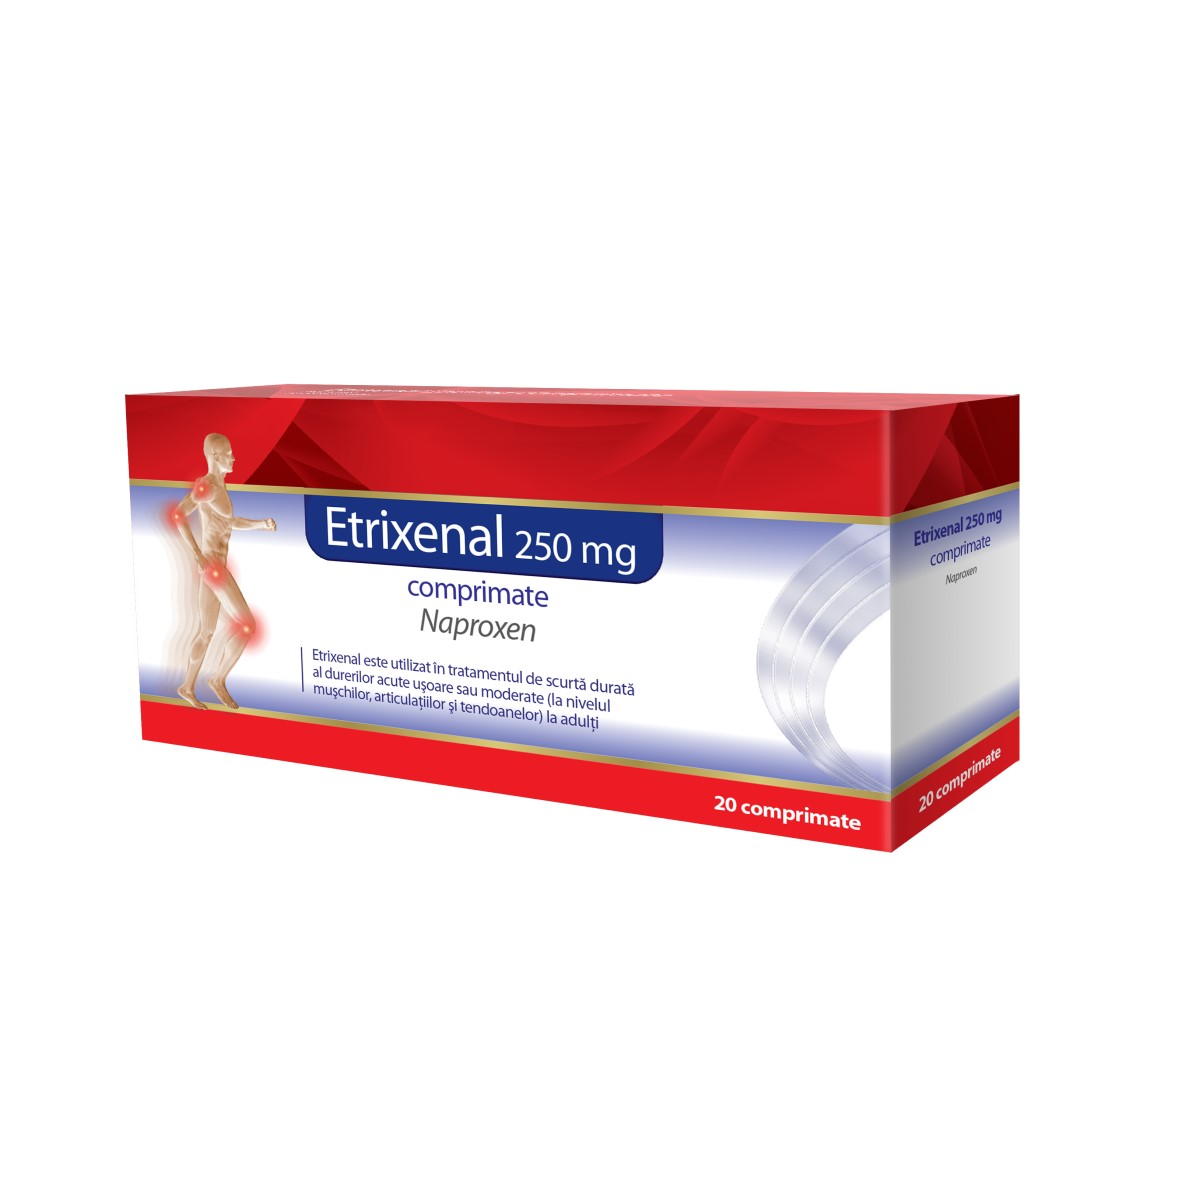 Etrixenal 250 mg Proenzi, 20 comprimate, Walmark